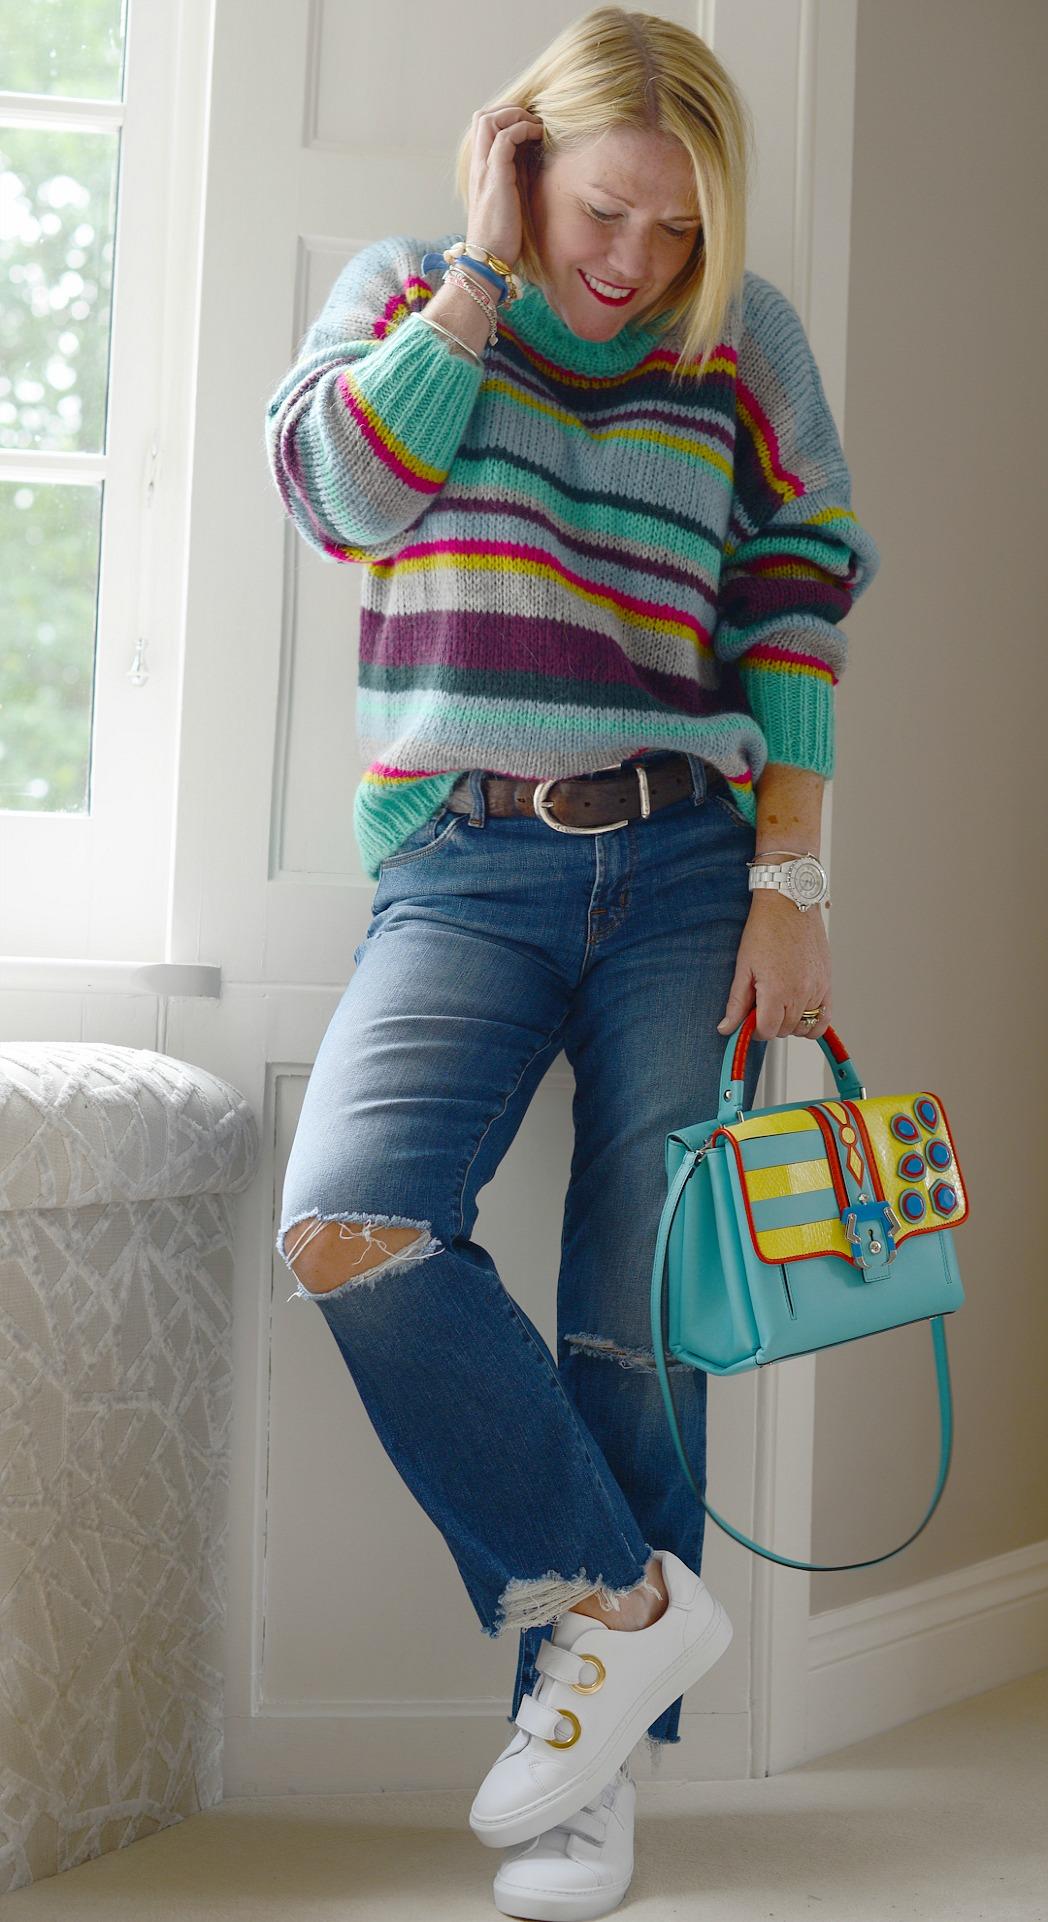 new-season-stripe-knits-for-petites-notesfromastylist